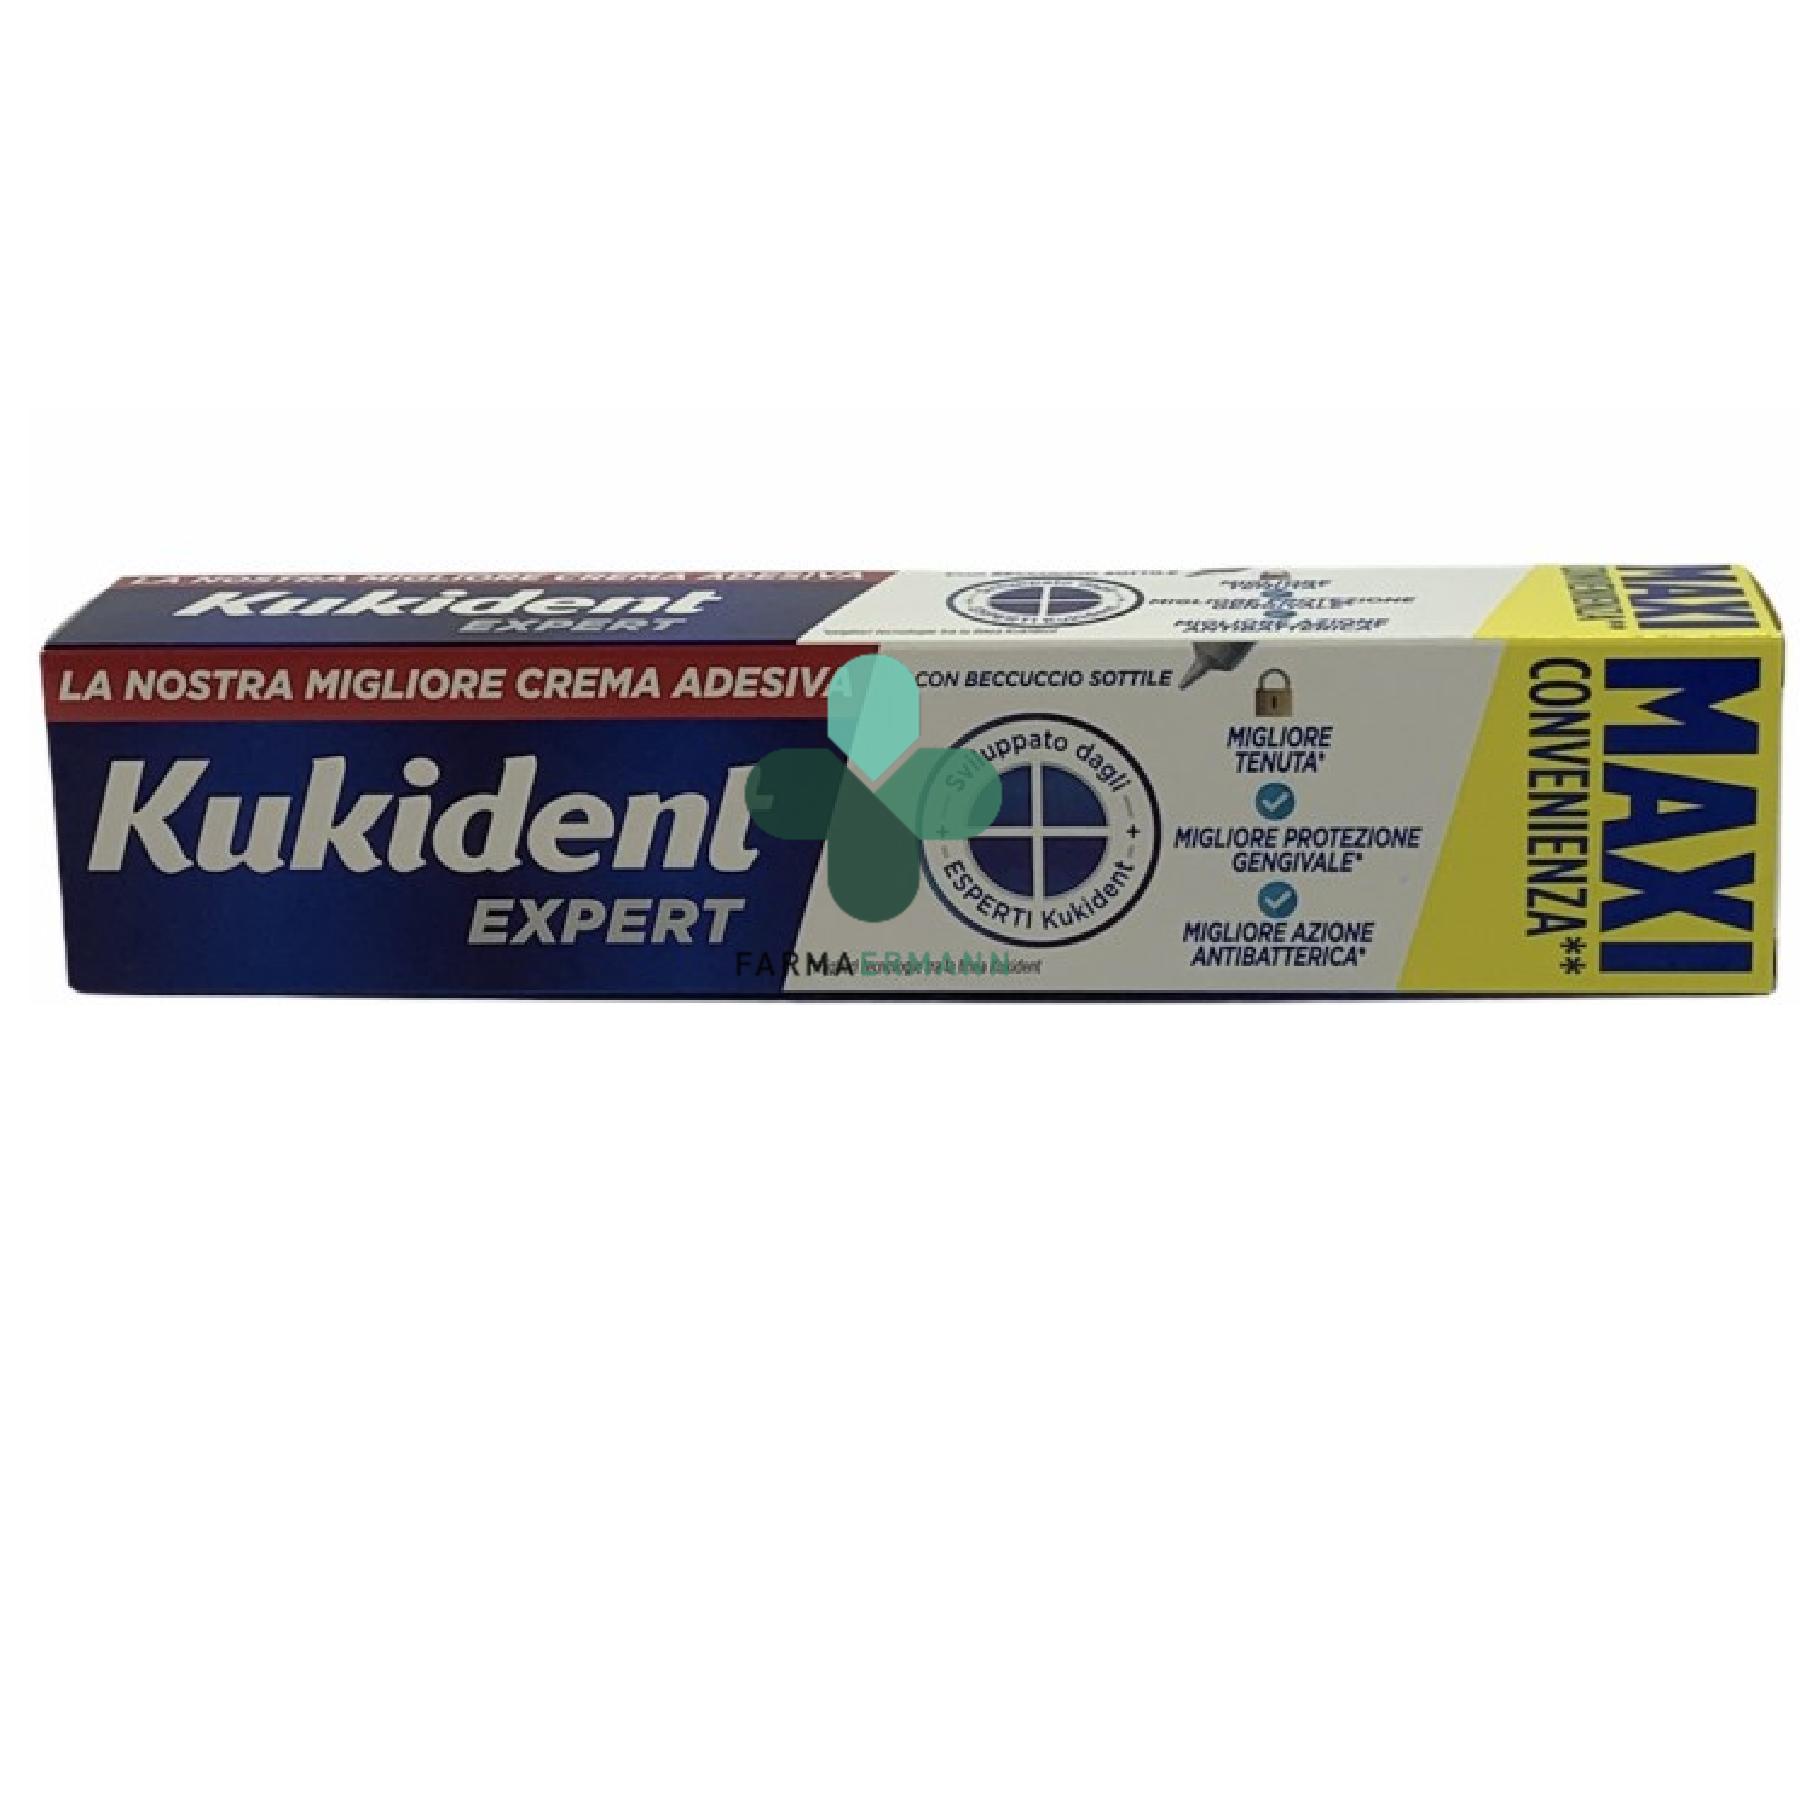 Procter & Gamble Kukident expert crema adesiva per dentiere (57 g)